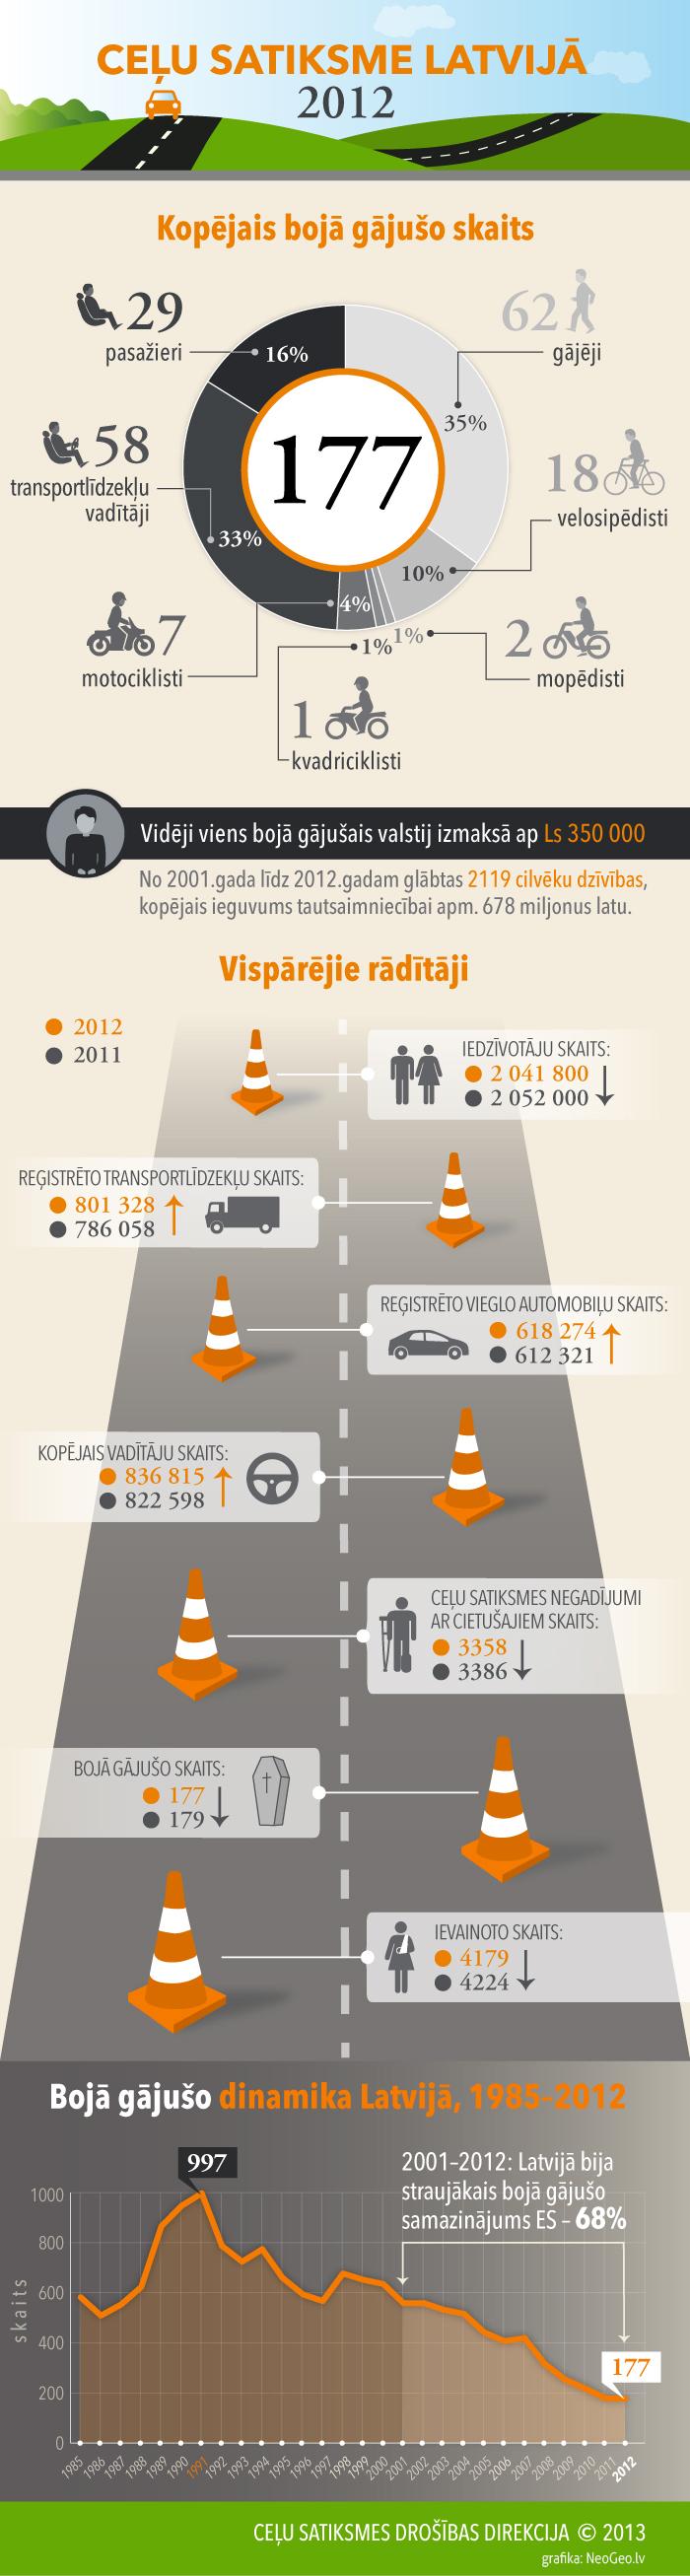 Infografika: Ceļu satiksme Latvijā - 2012